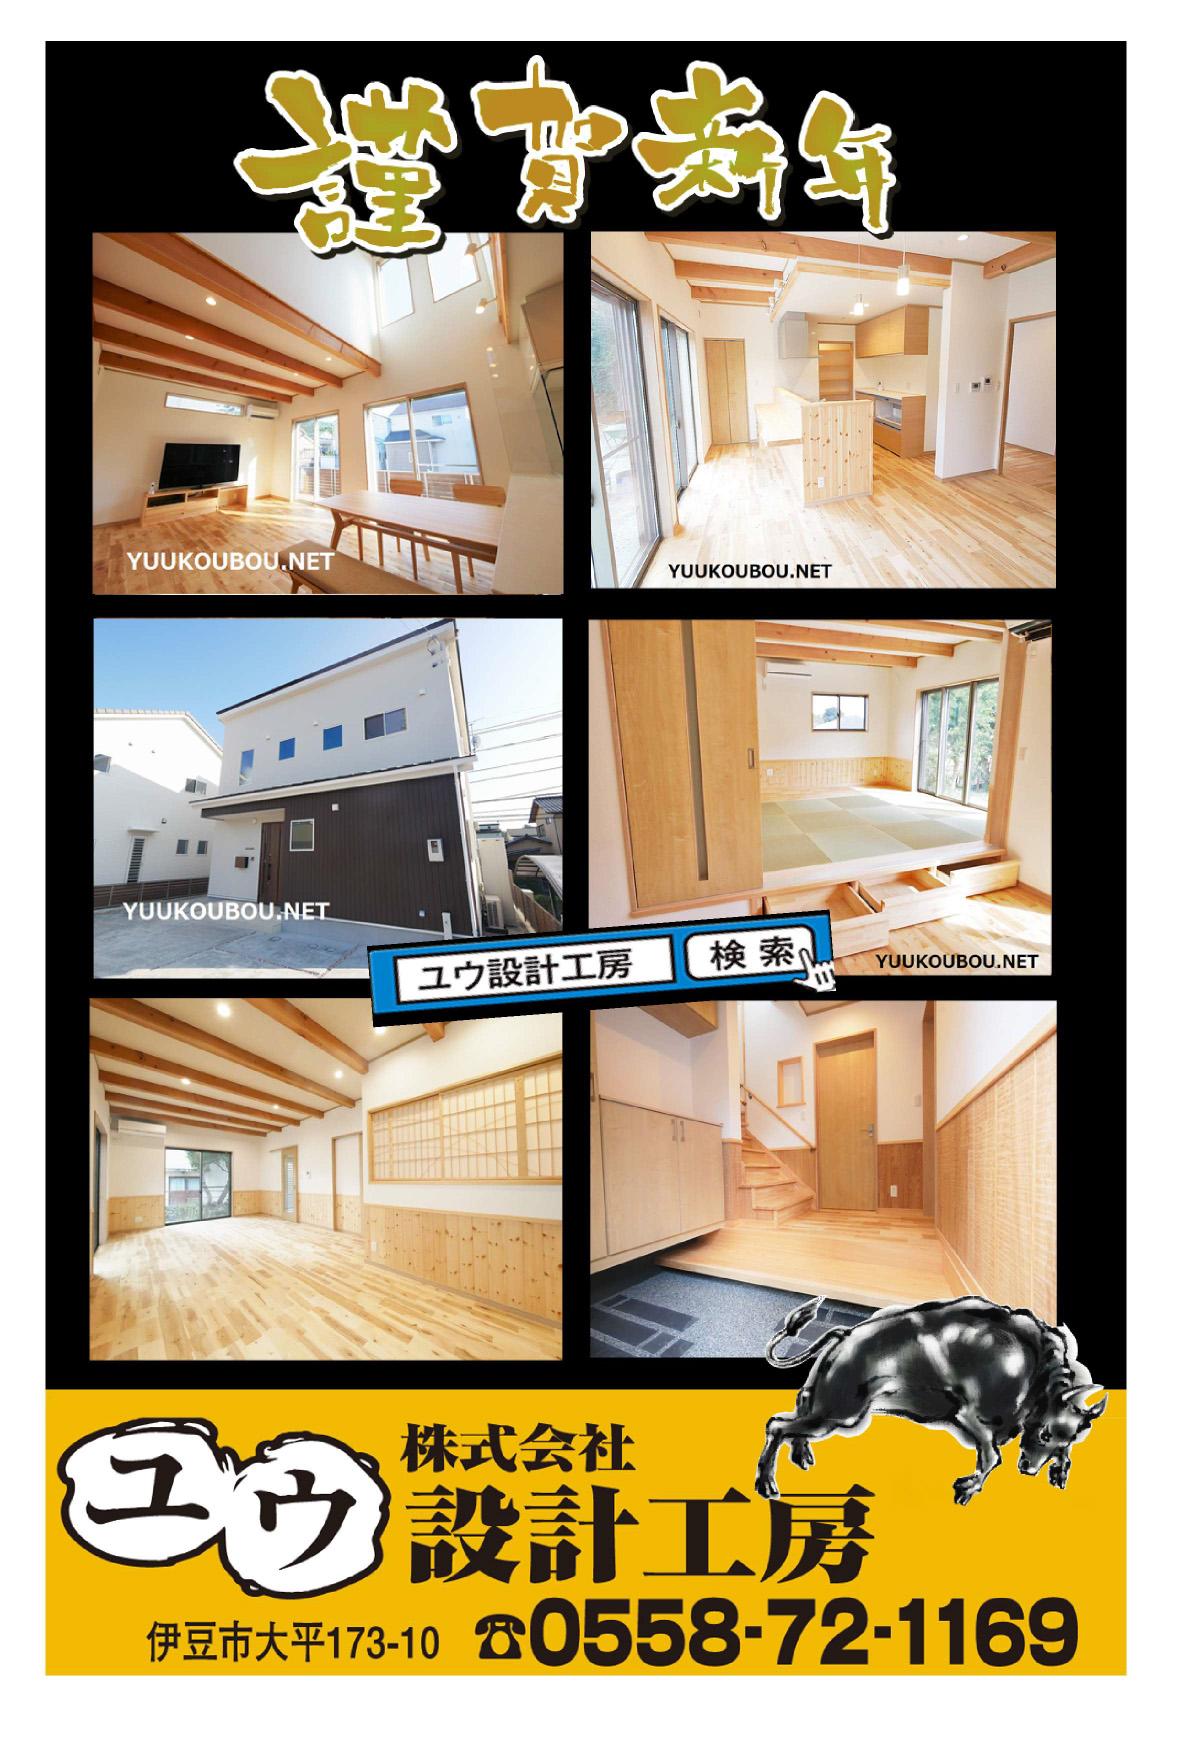 http://www.yuukoubou.net/blog/%E5%B9%B4%E8%B3%80.jpg